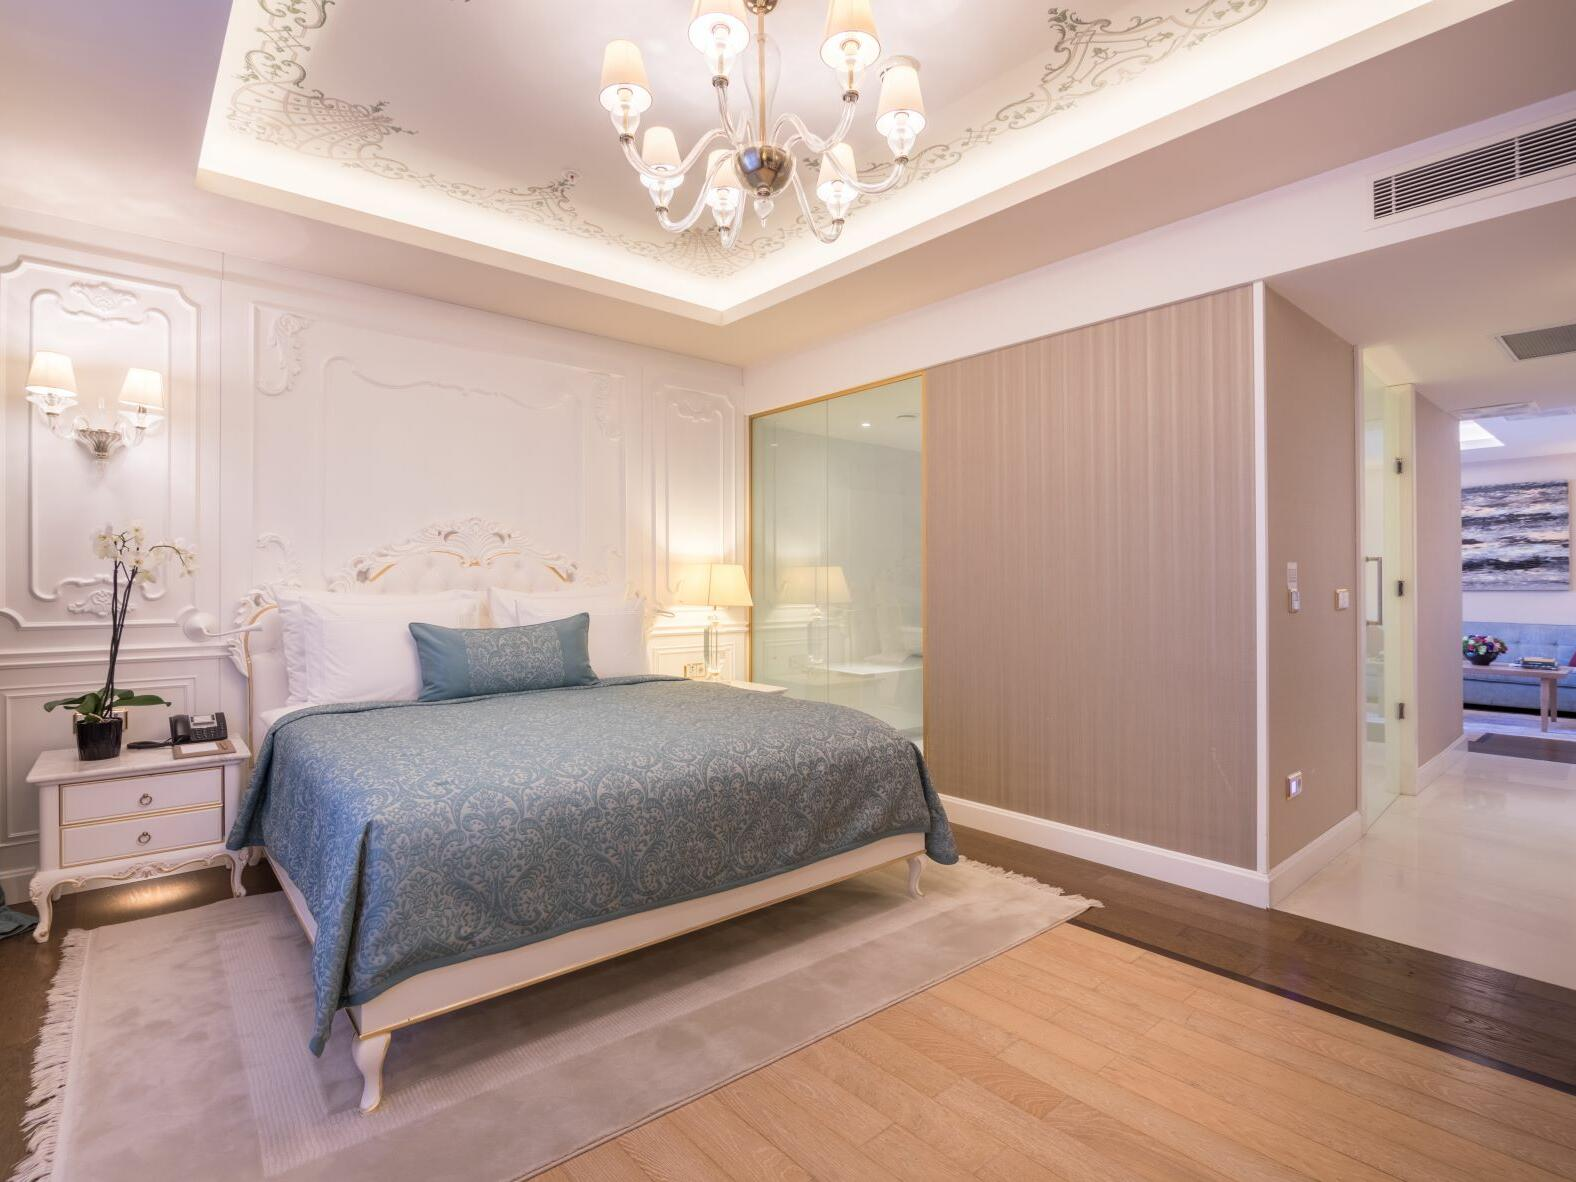 Luxury Family Suite CVK Park Bosphorus Hotel İstanbul